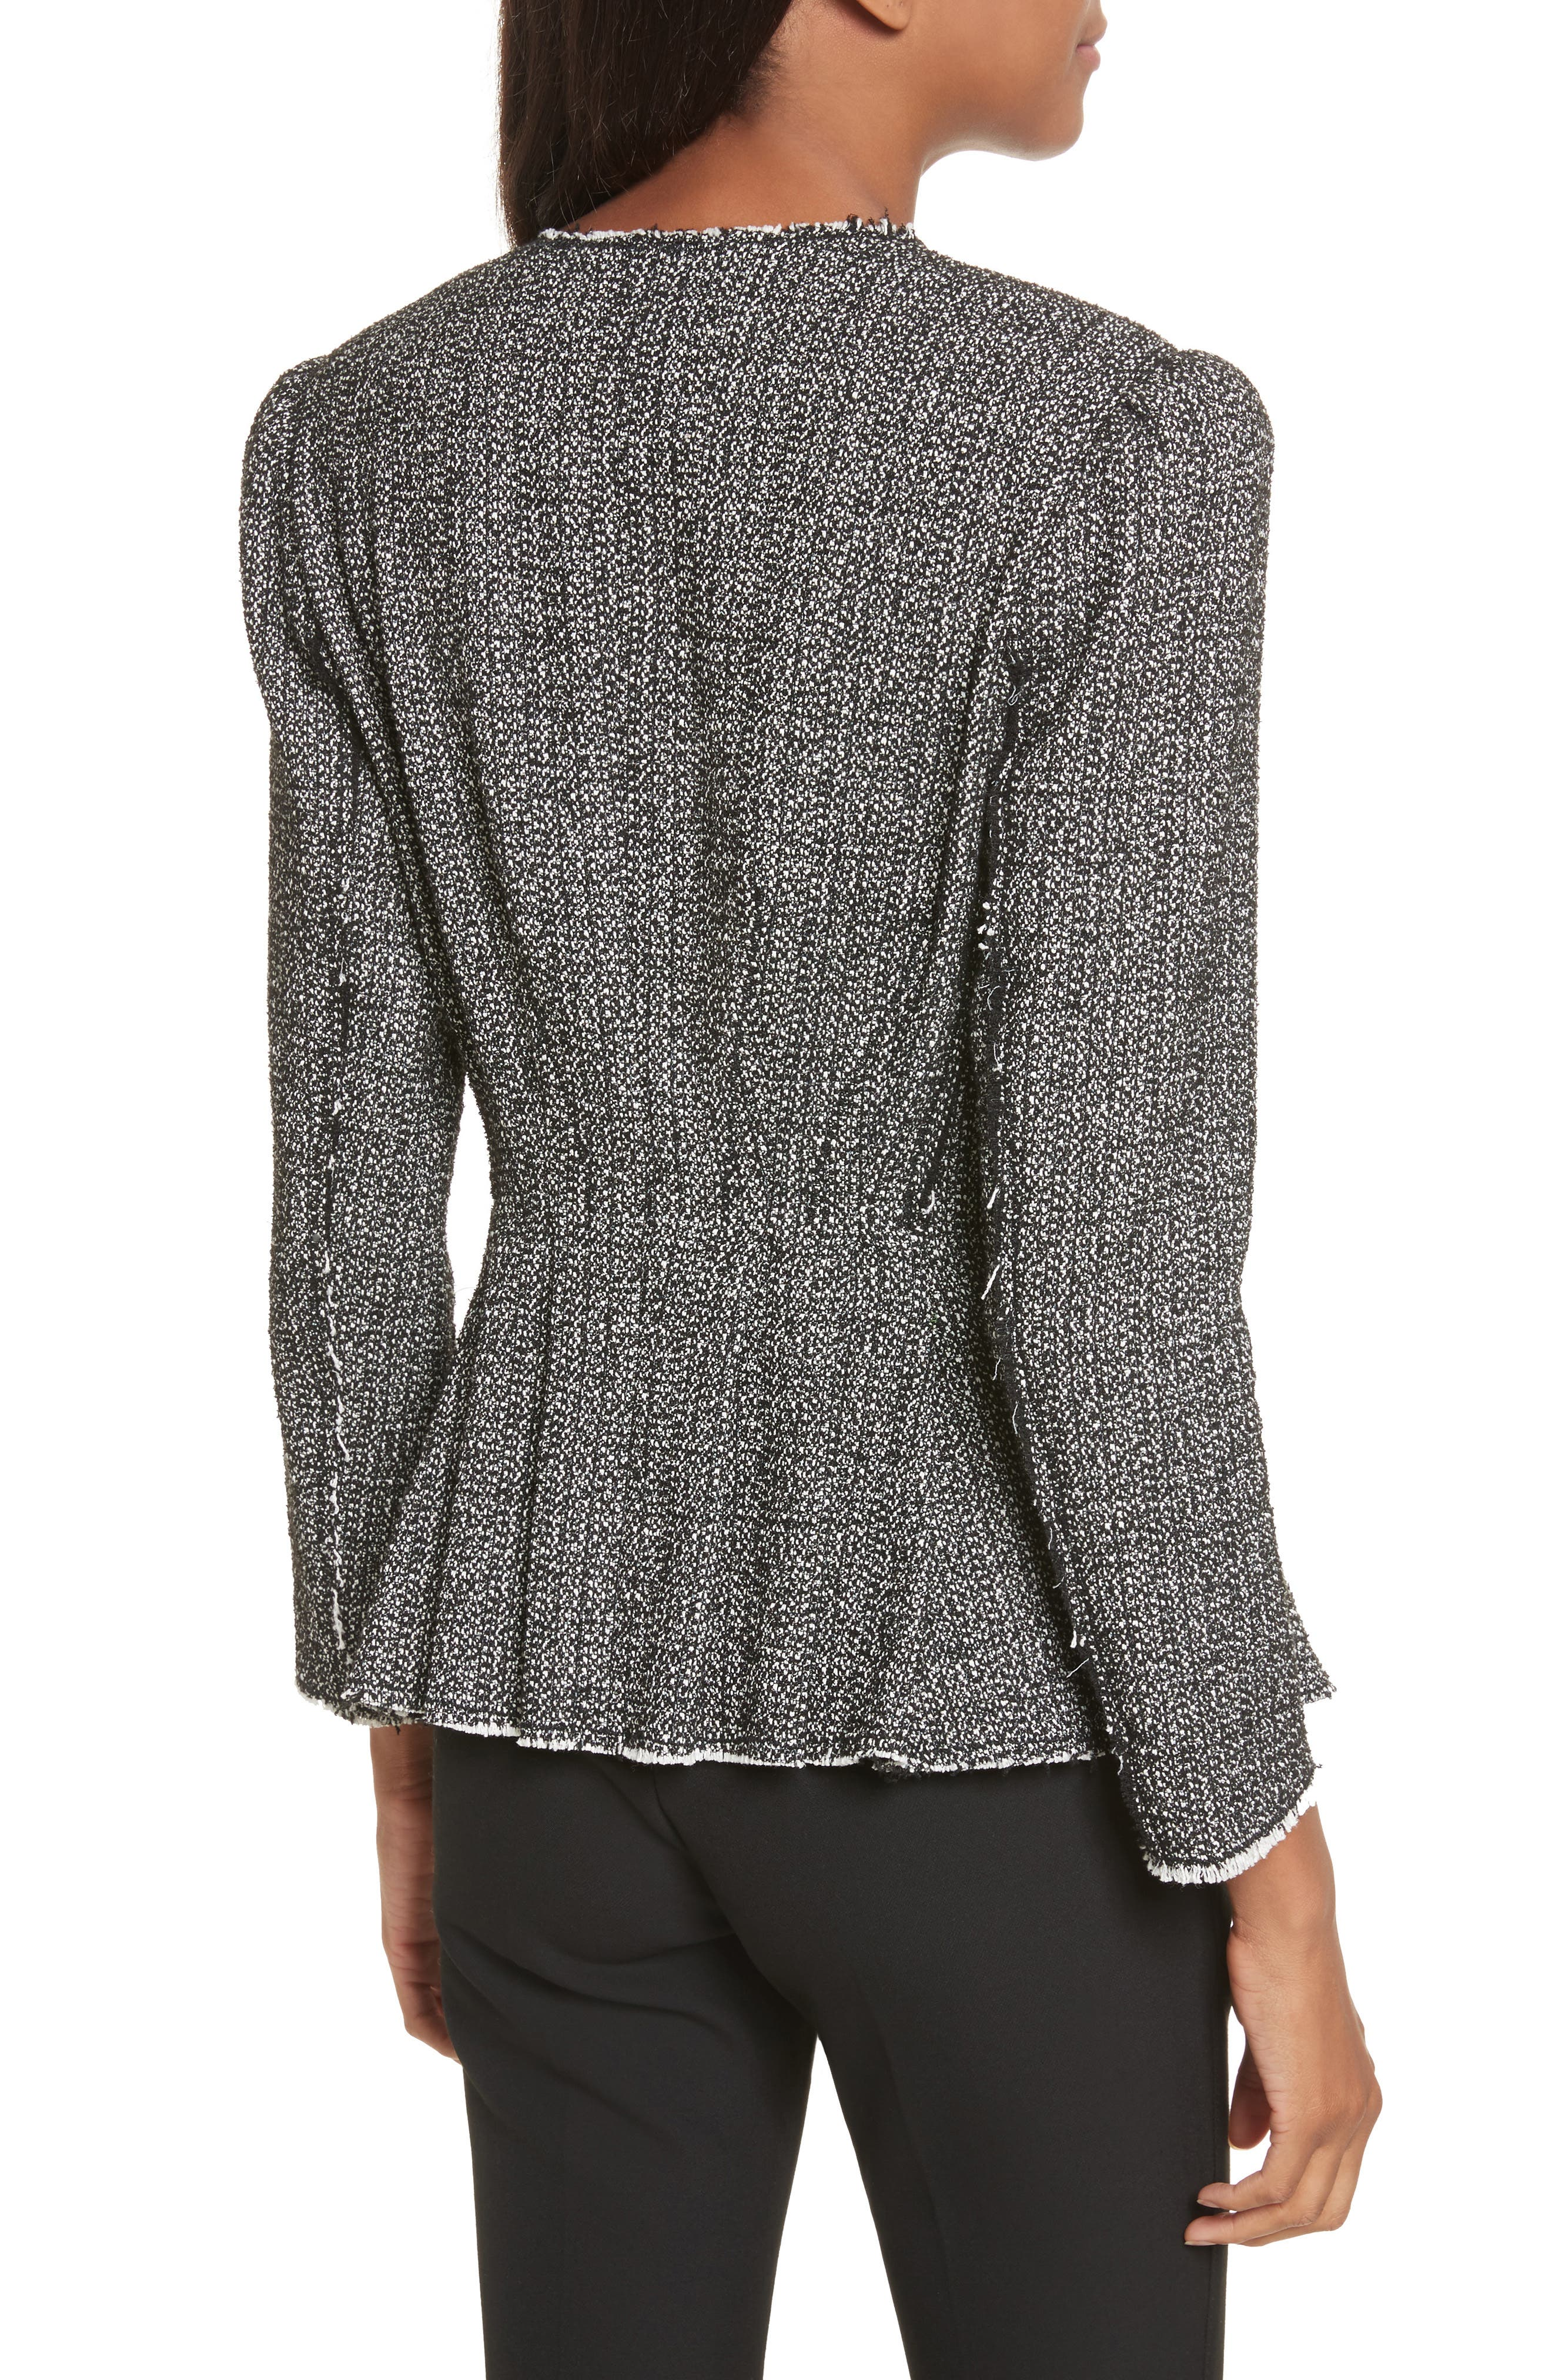 Texture Tweed Jacket,                             Alternate thumbnail 2, color,                             Black Combo